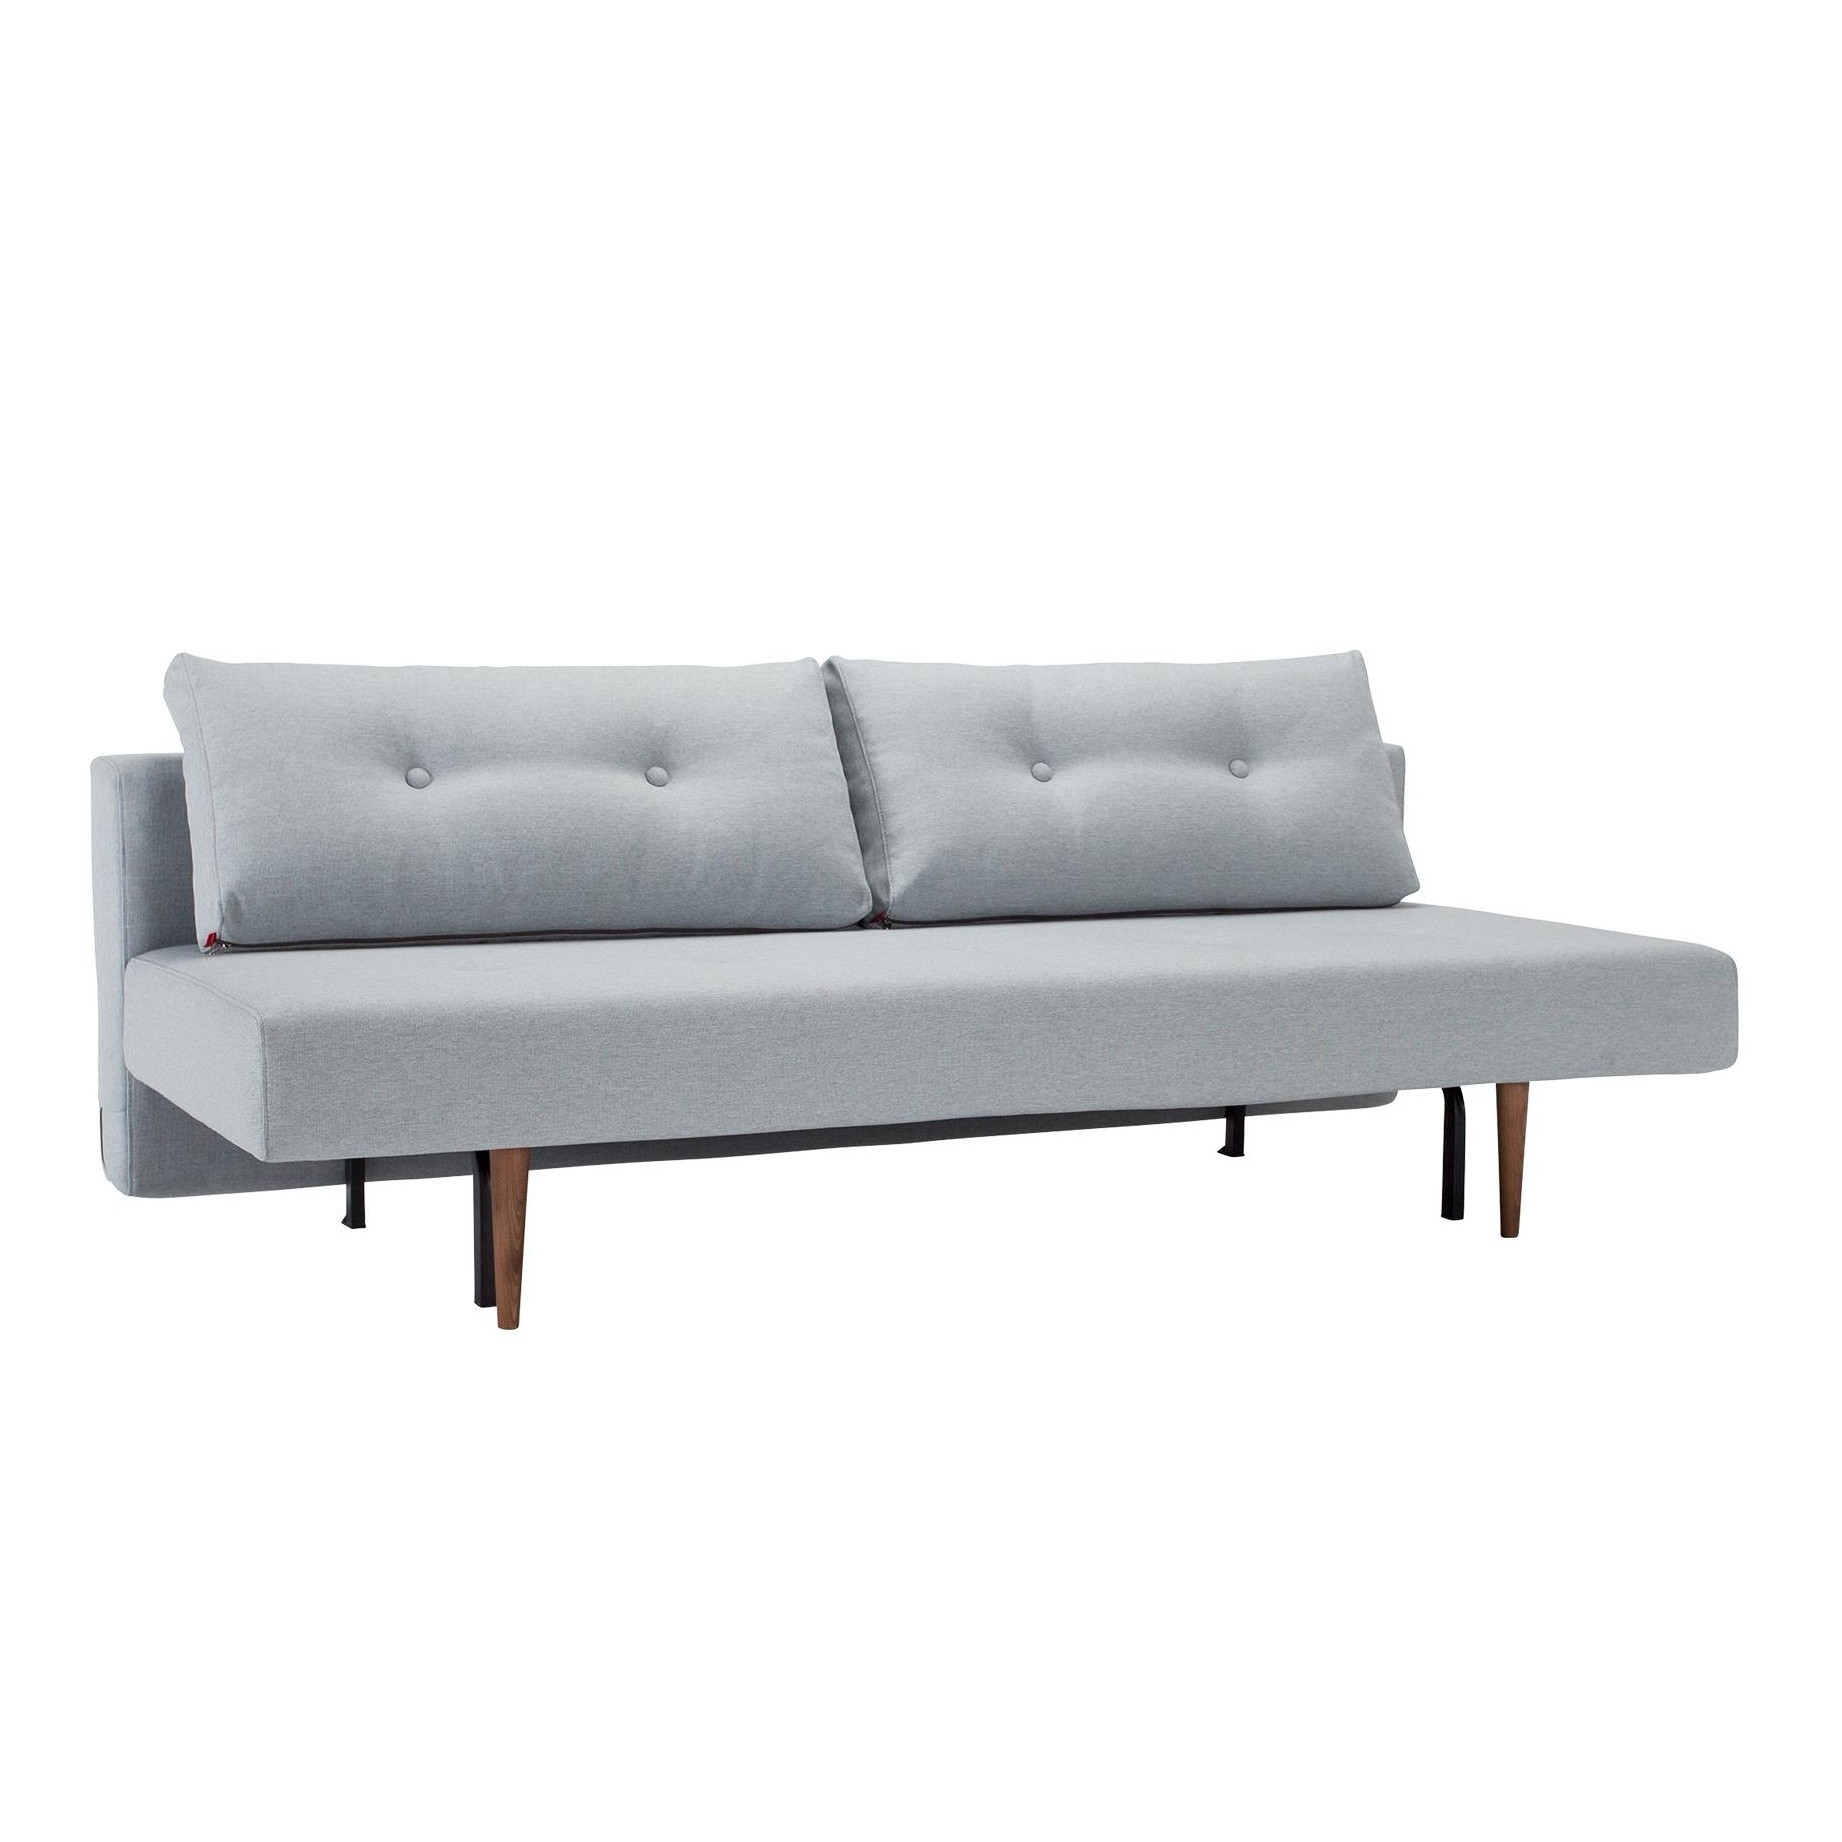 Innovation Recast Sofa Bed Light Blue Grey Frame Wood Fabric 552 Soft